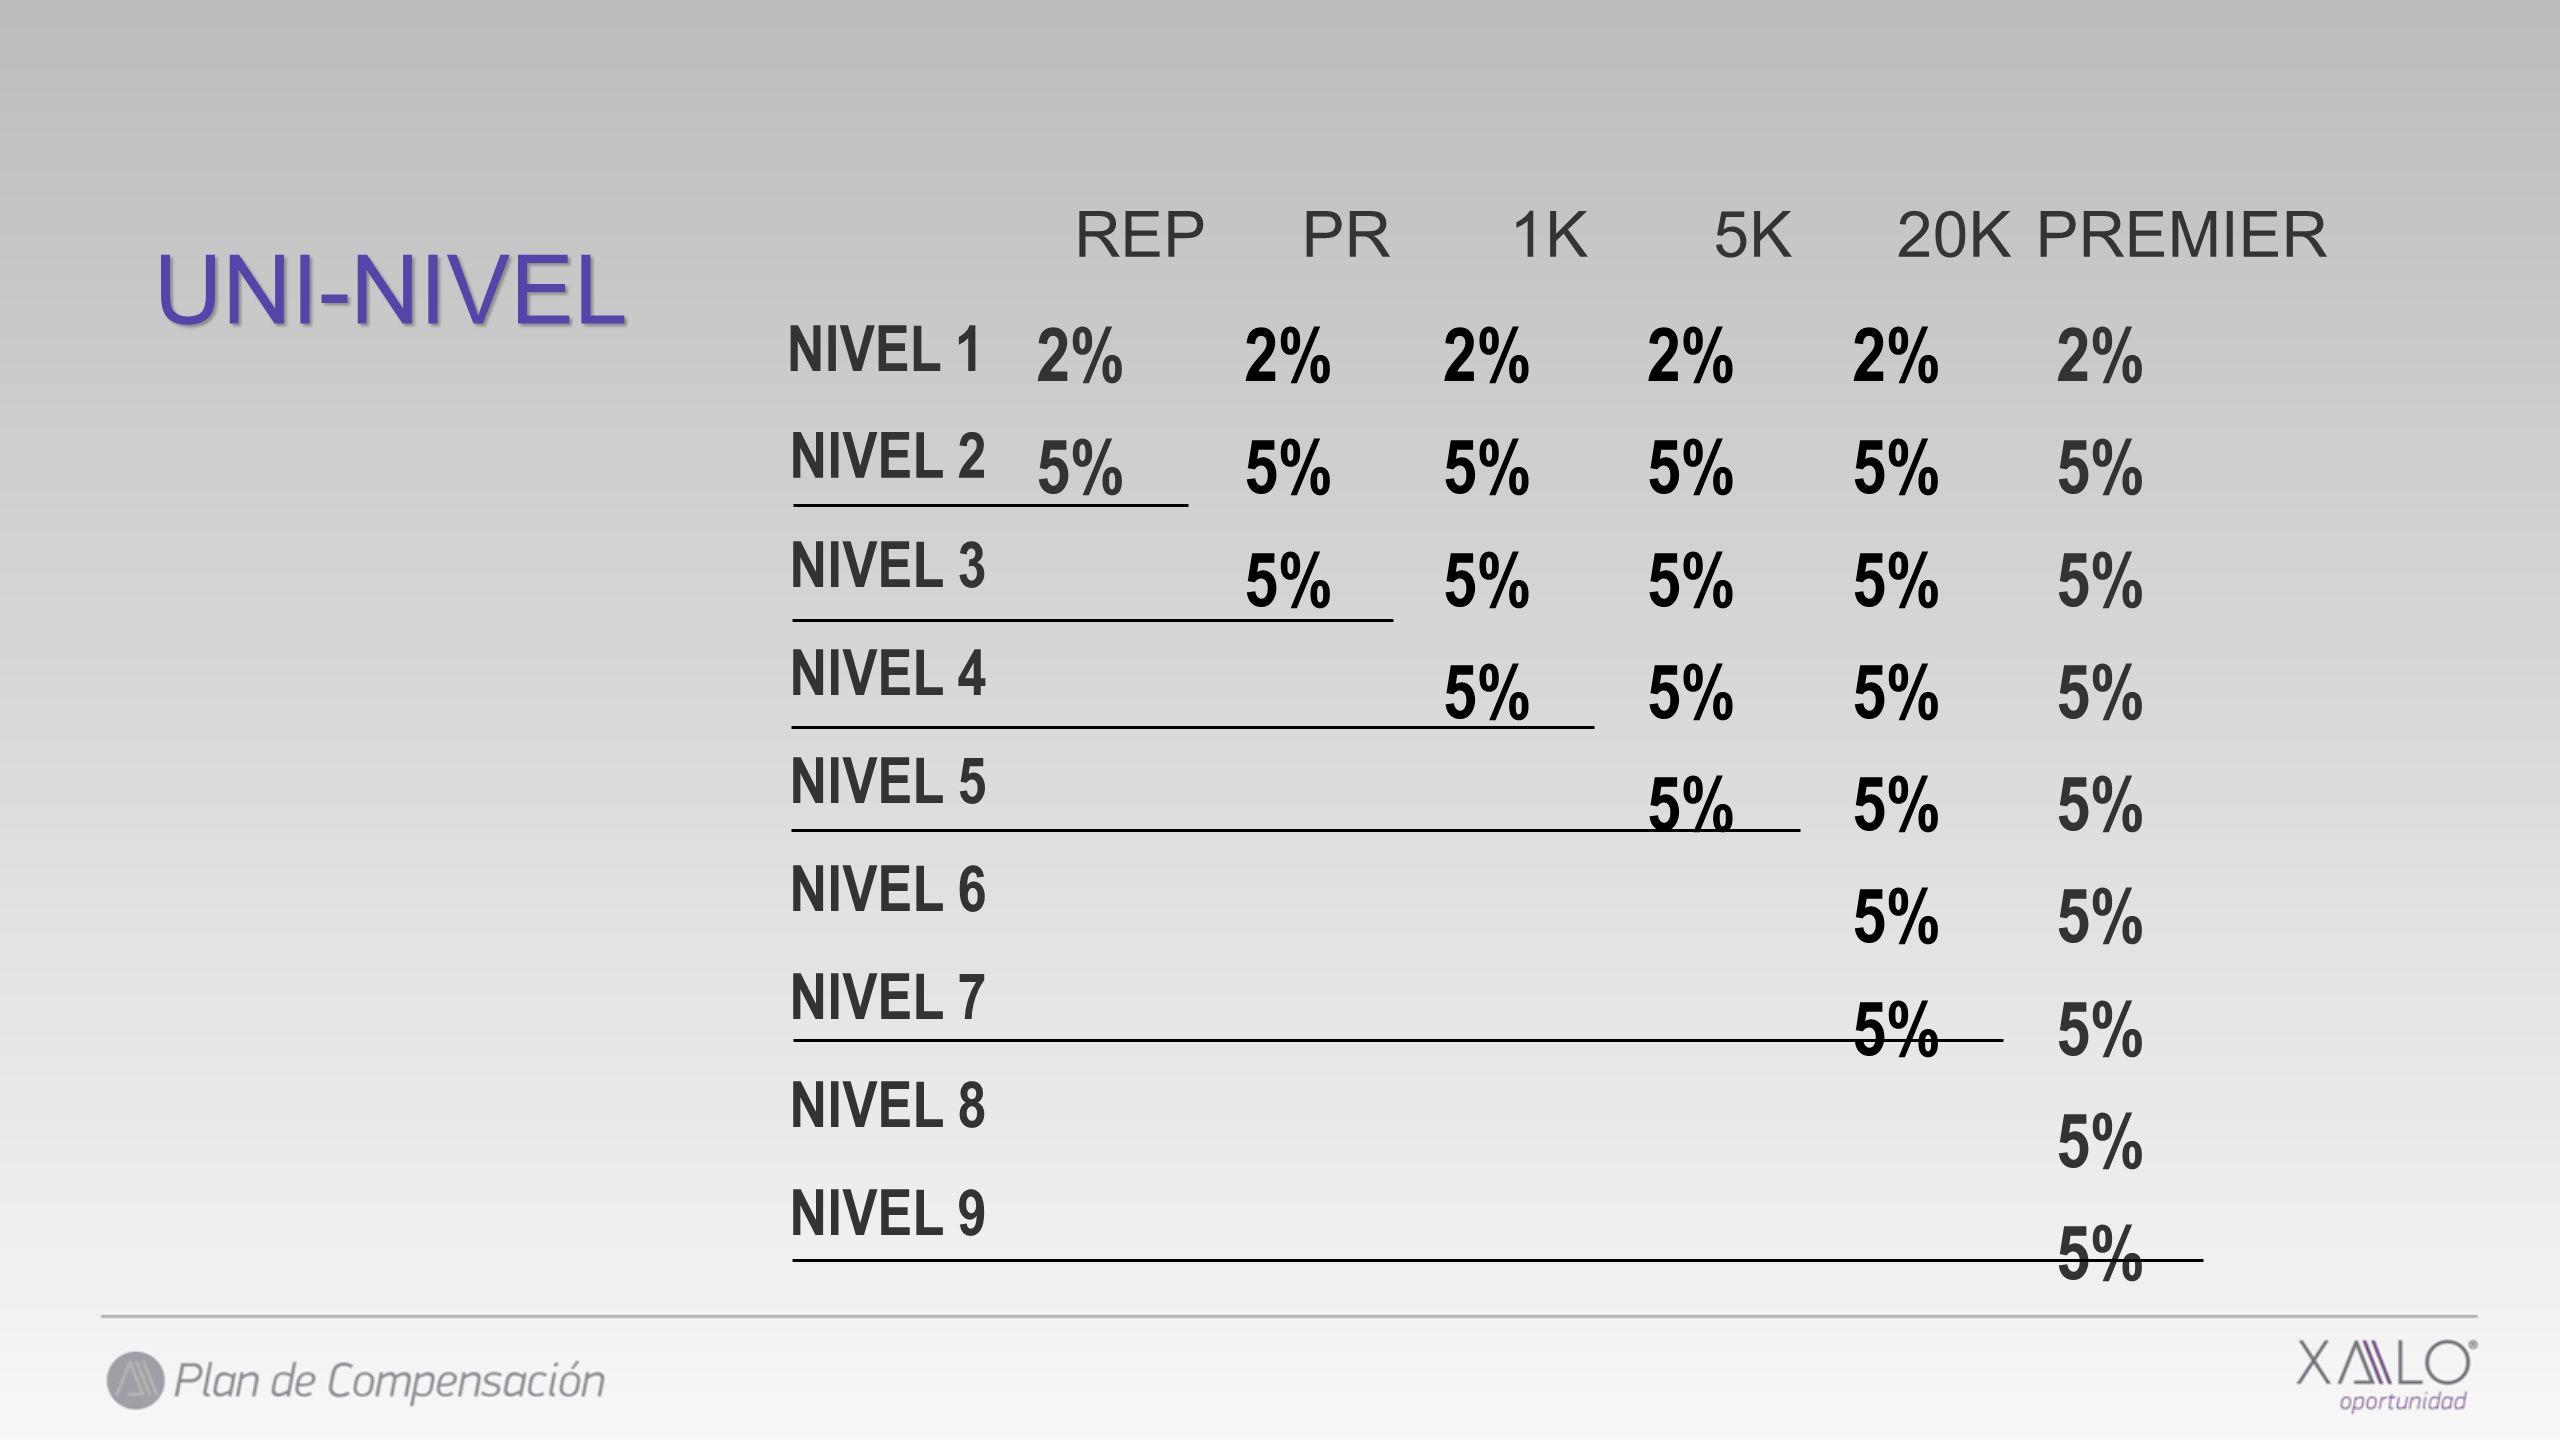 REPPR 2% 5% NIVEL 3 1K 2% 5% NIVEL 4 5K 2% 5% NIVEL 5 20K 2% 5% NIVEL 6 NIVEL 7 PREMIER 2% 5% NIVEL 8 NIVEL 9 2% 5% NIVEL 2 NIVEL 1 UNI-NIVEL